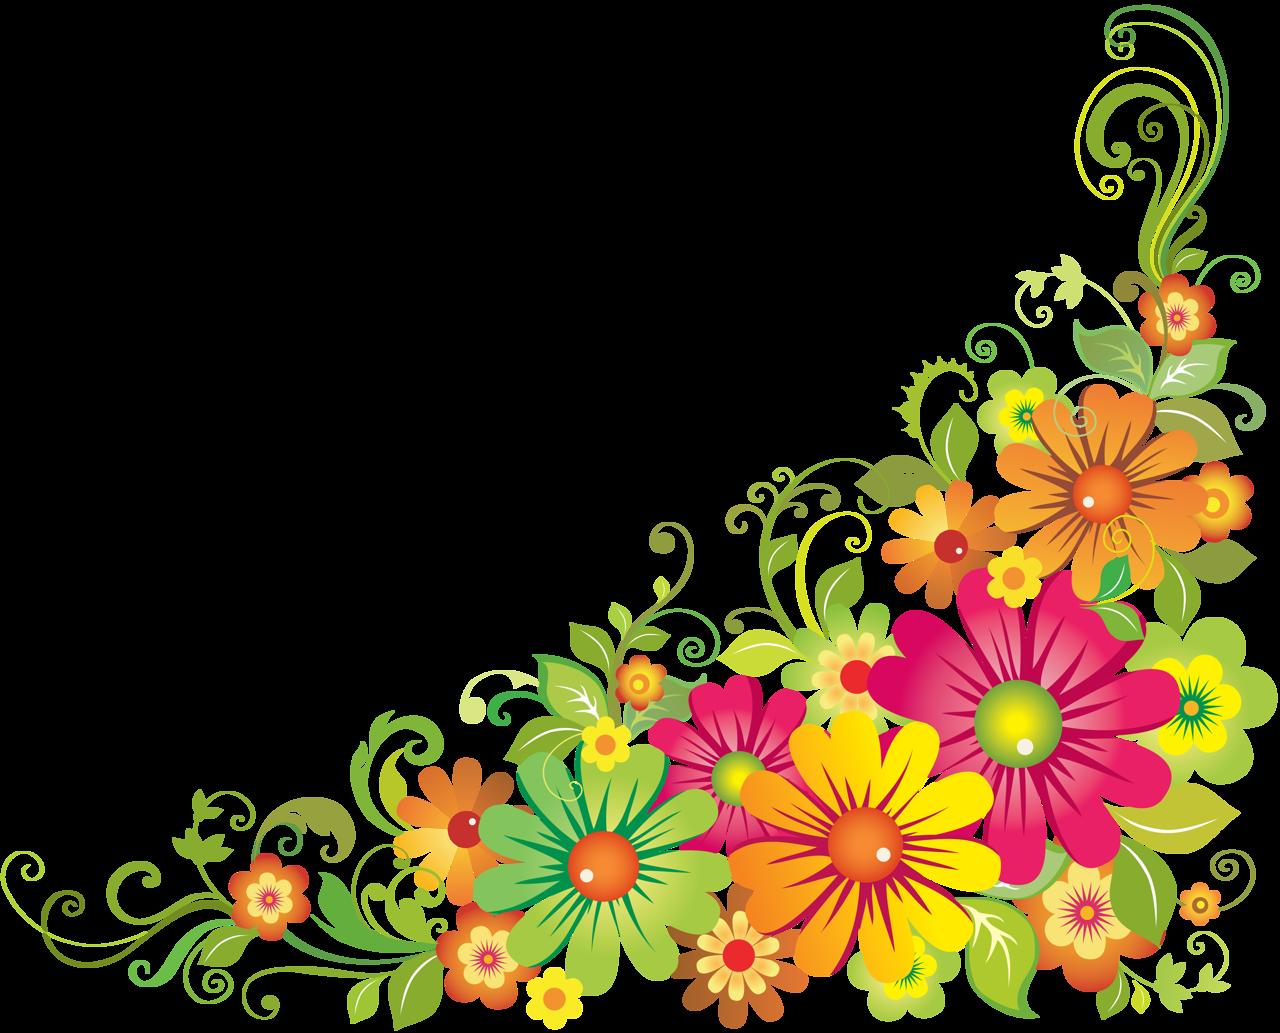 Corner flower clipart clipart transparent stock 0_64762_703f1e17_orig.png | Pinterest | Clip art, Corner and ... clipart transparent stock